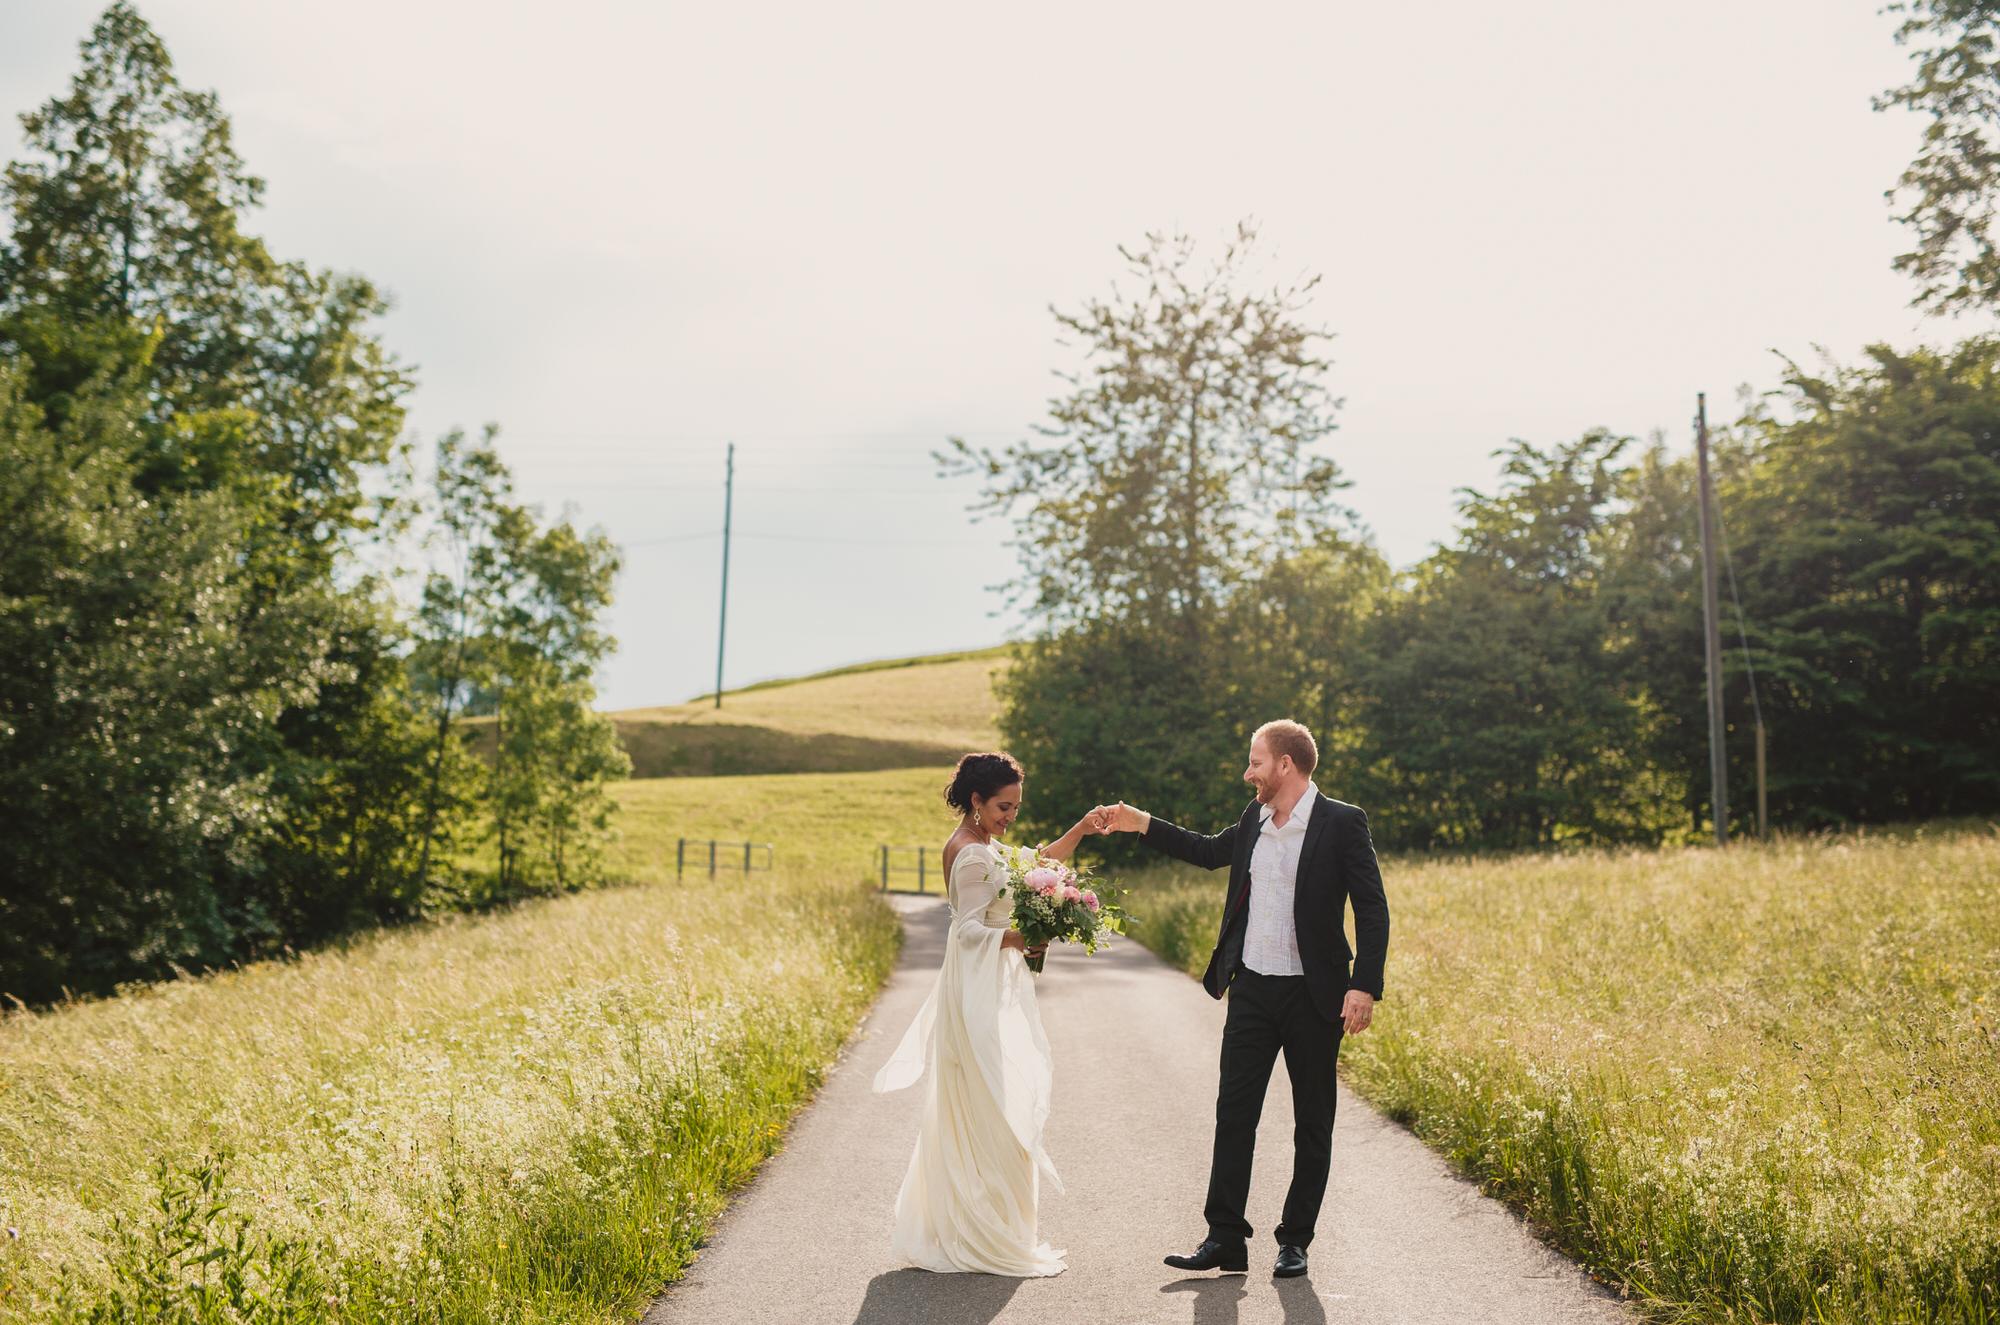 SWITZERLAND WEDDING SHOOT - JENNIFER PICARD PHOTOGRAPHY - SWITZERLAND WEDDING PHOTOGRAPHER - VANCOUVER WEDDING PHOTOGRAPHER -  (137).jpg